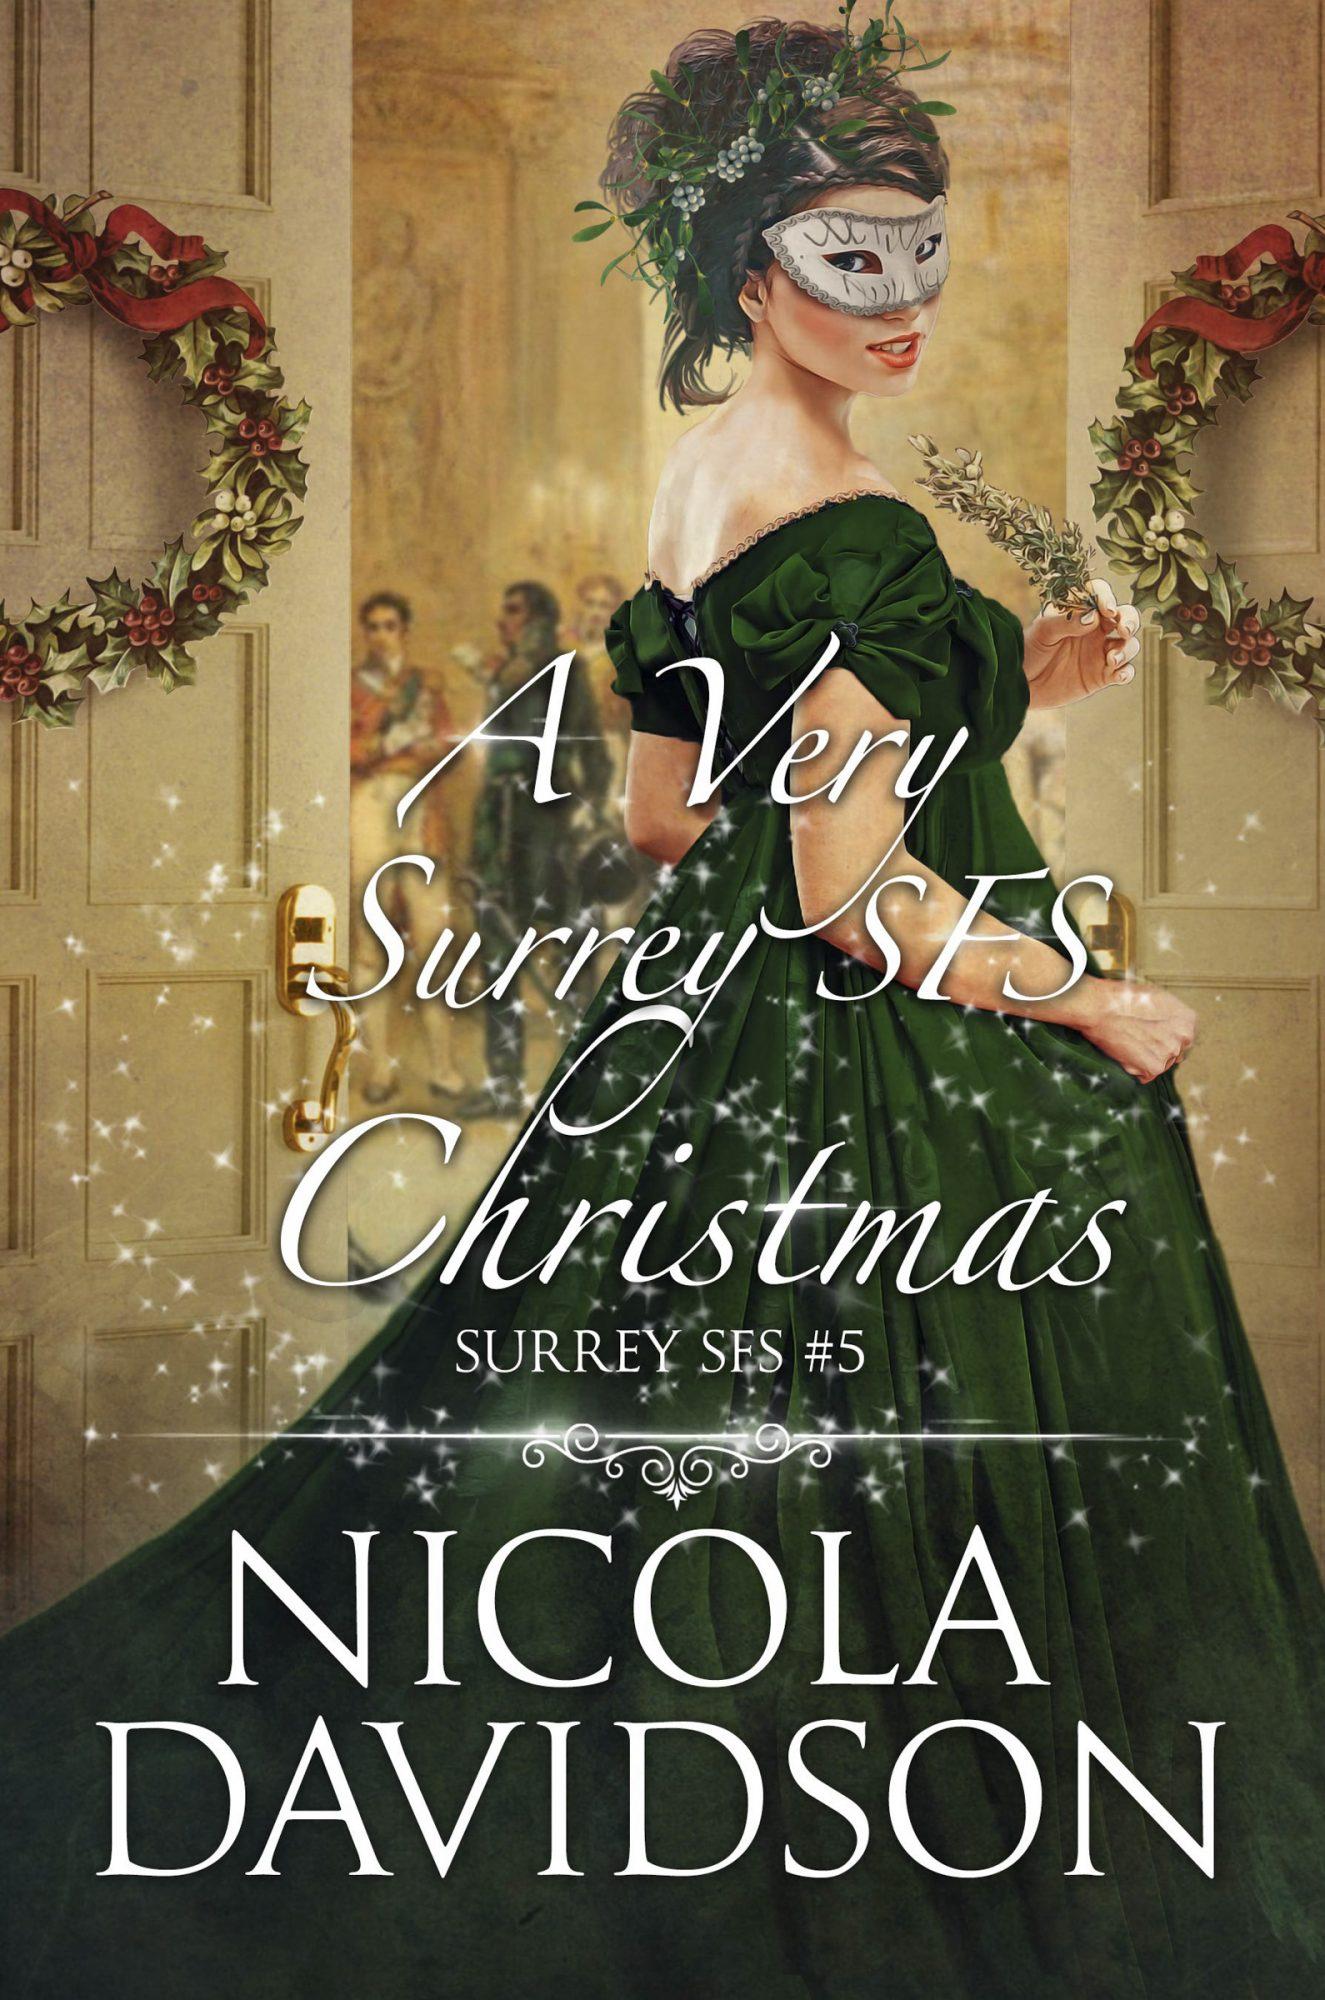 Very Surrey SFS Christmas by Nicola Davidson